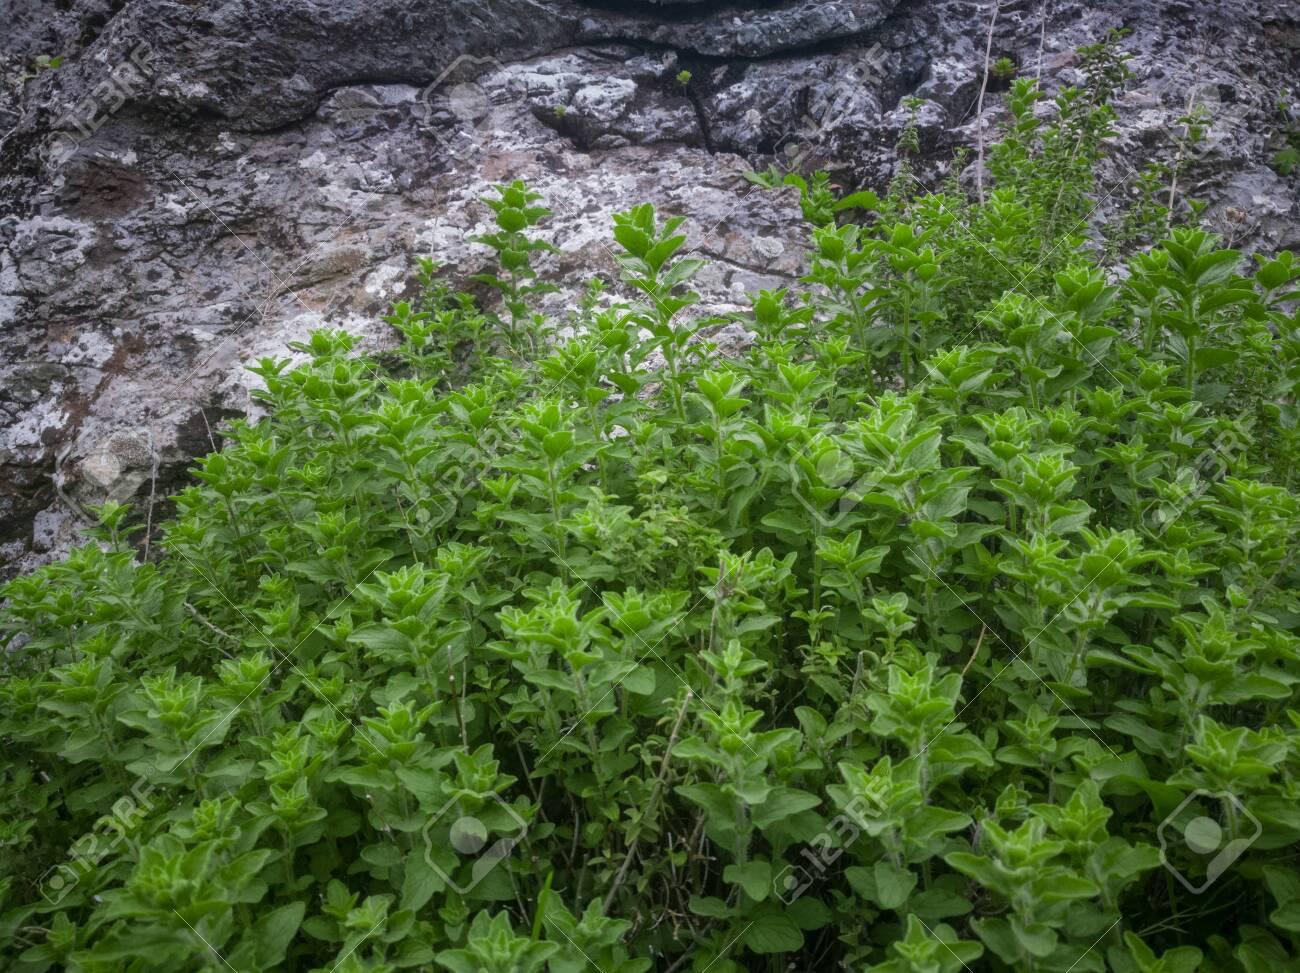 Wild oregano grows in the mountains. Raw green Oregano in field. Greek natural herb oregano. Green and fresh oregano flowers. Aromatic culinary herbs. - 142962148